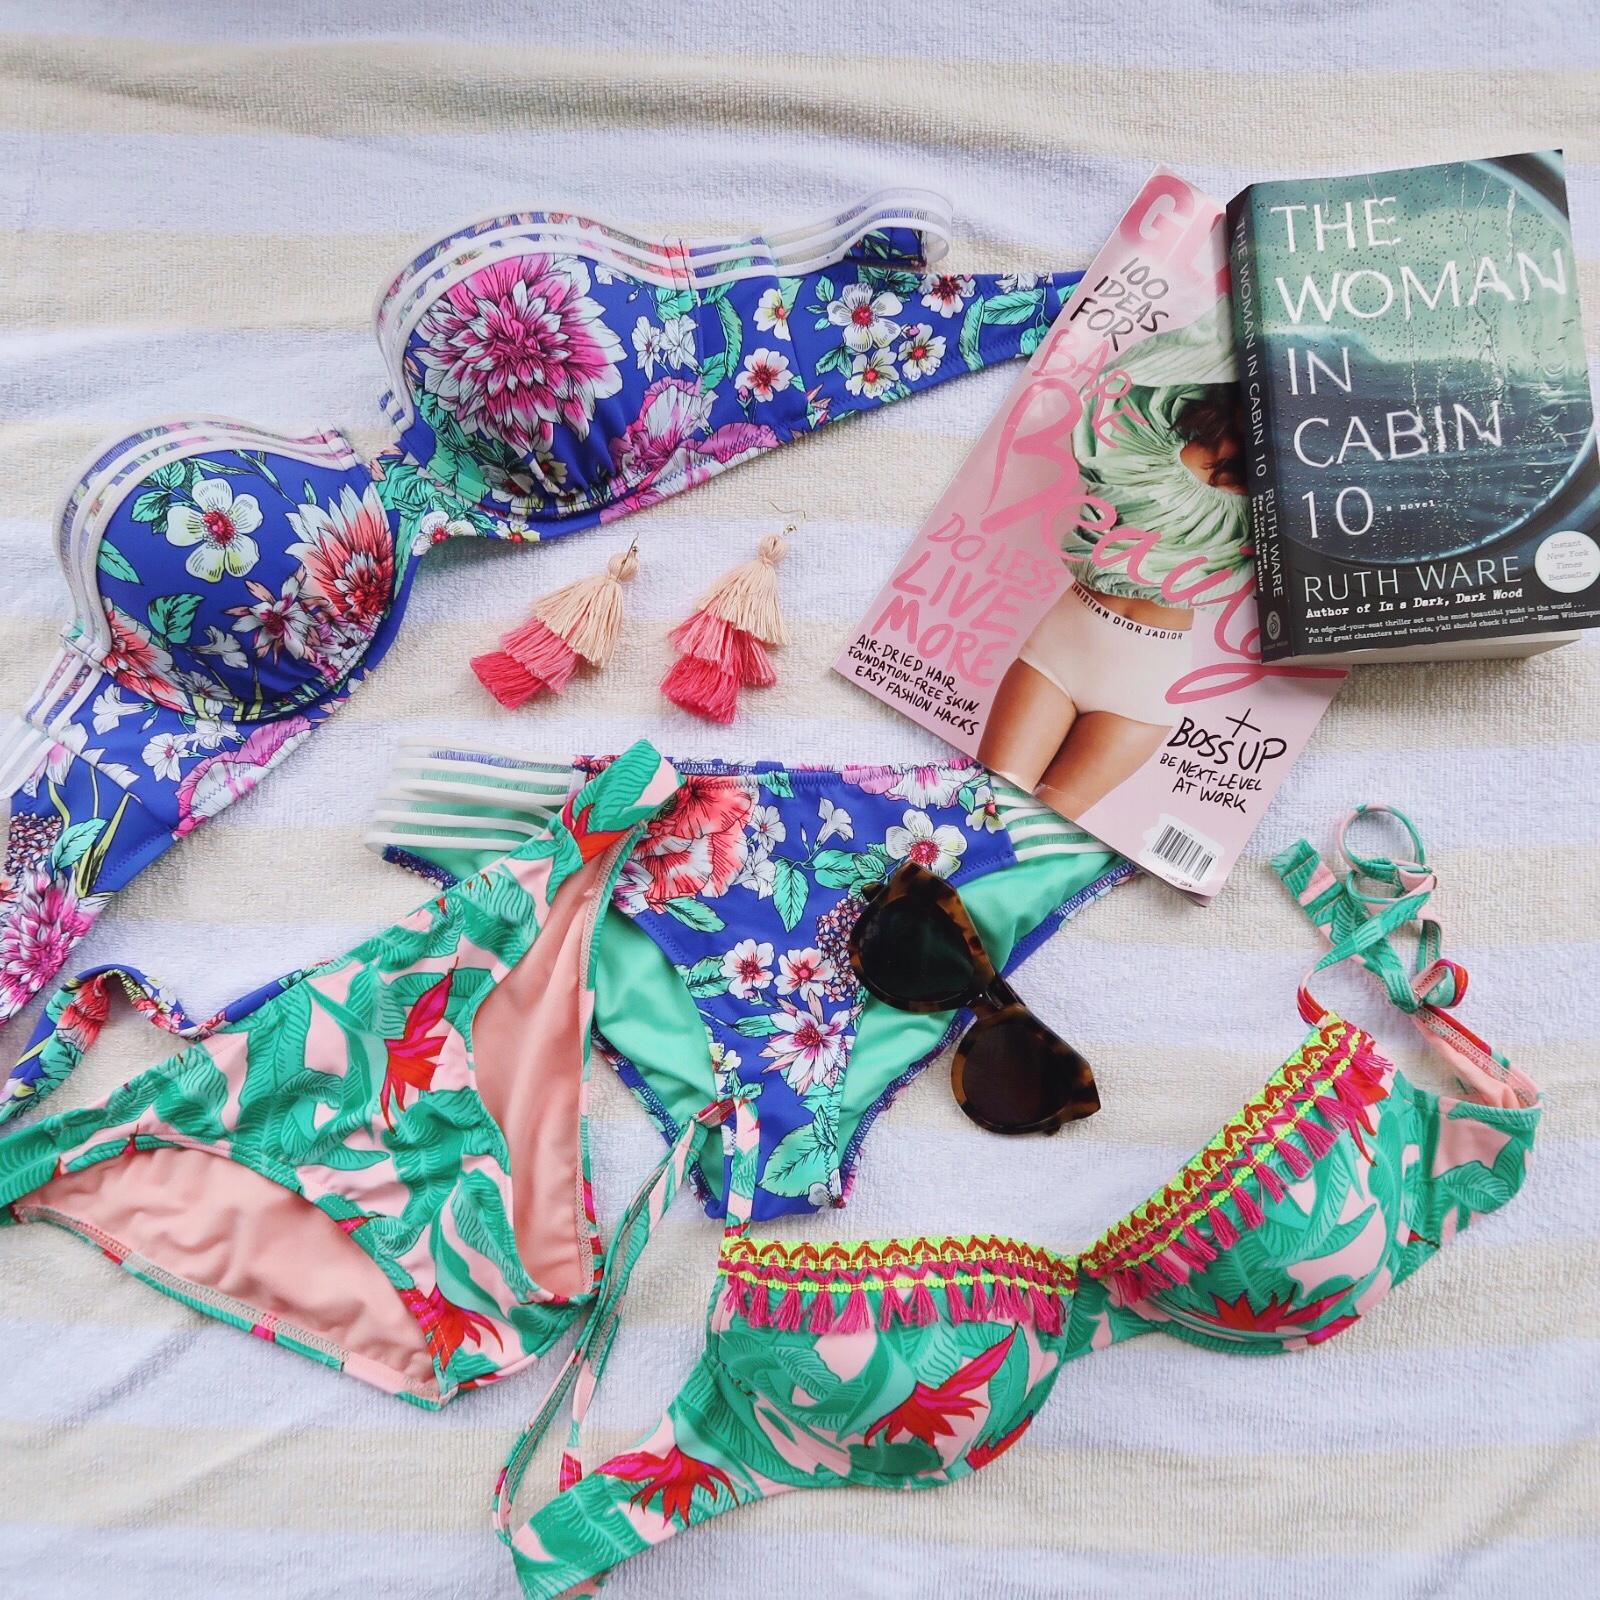 Hilton Hilton Head Travel Guide / budget friendly bikinis